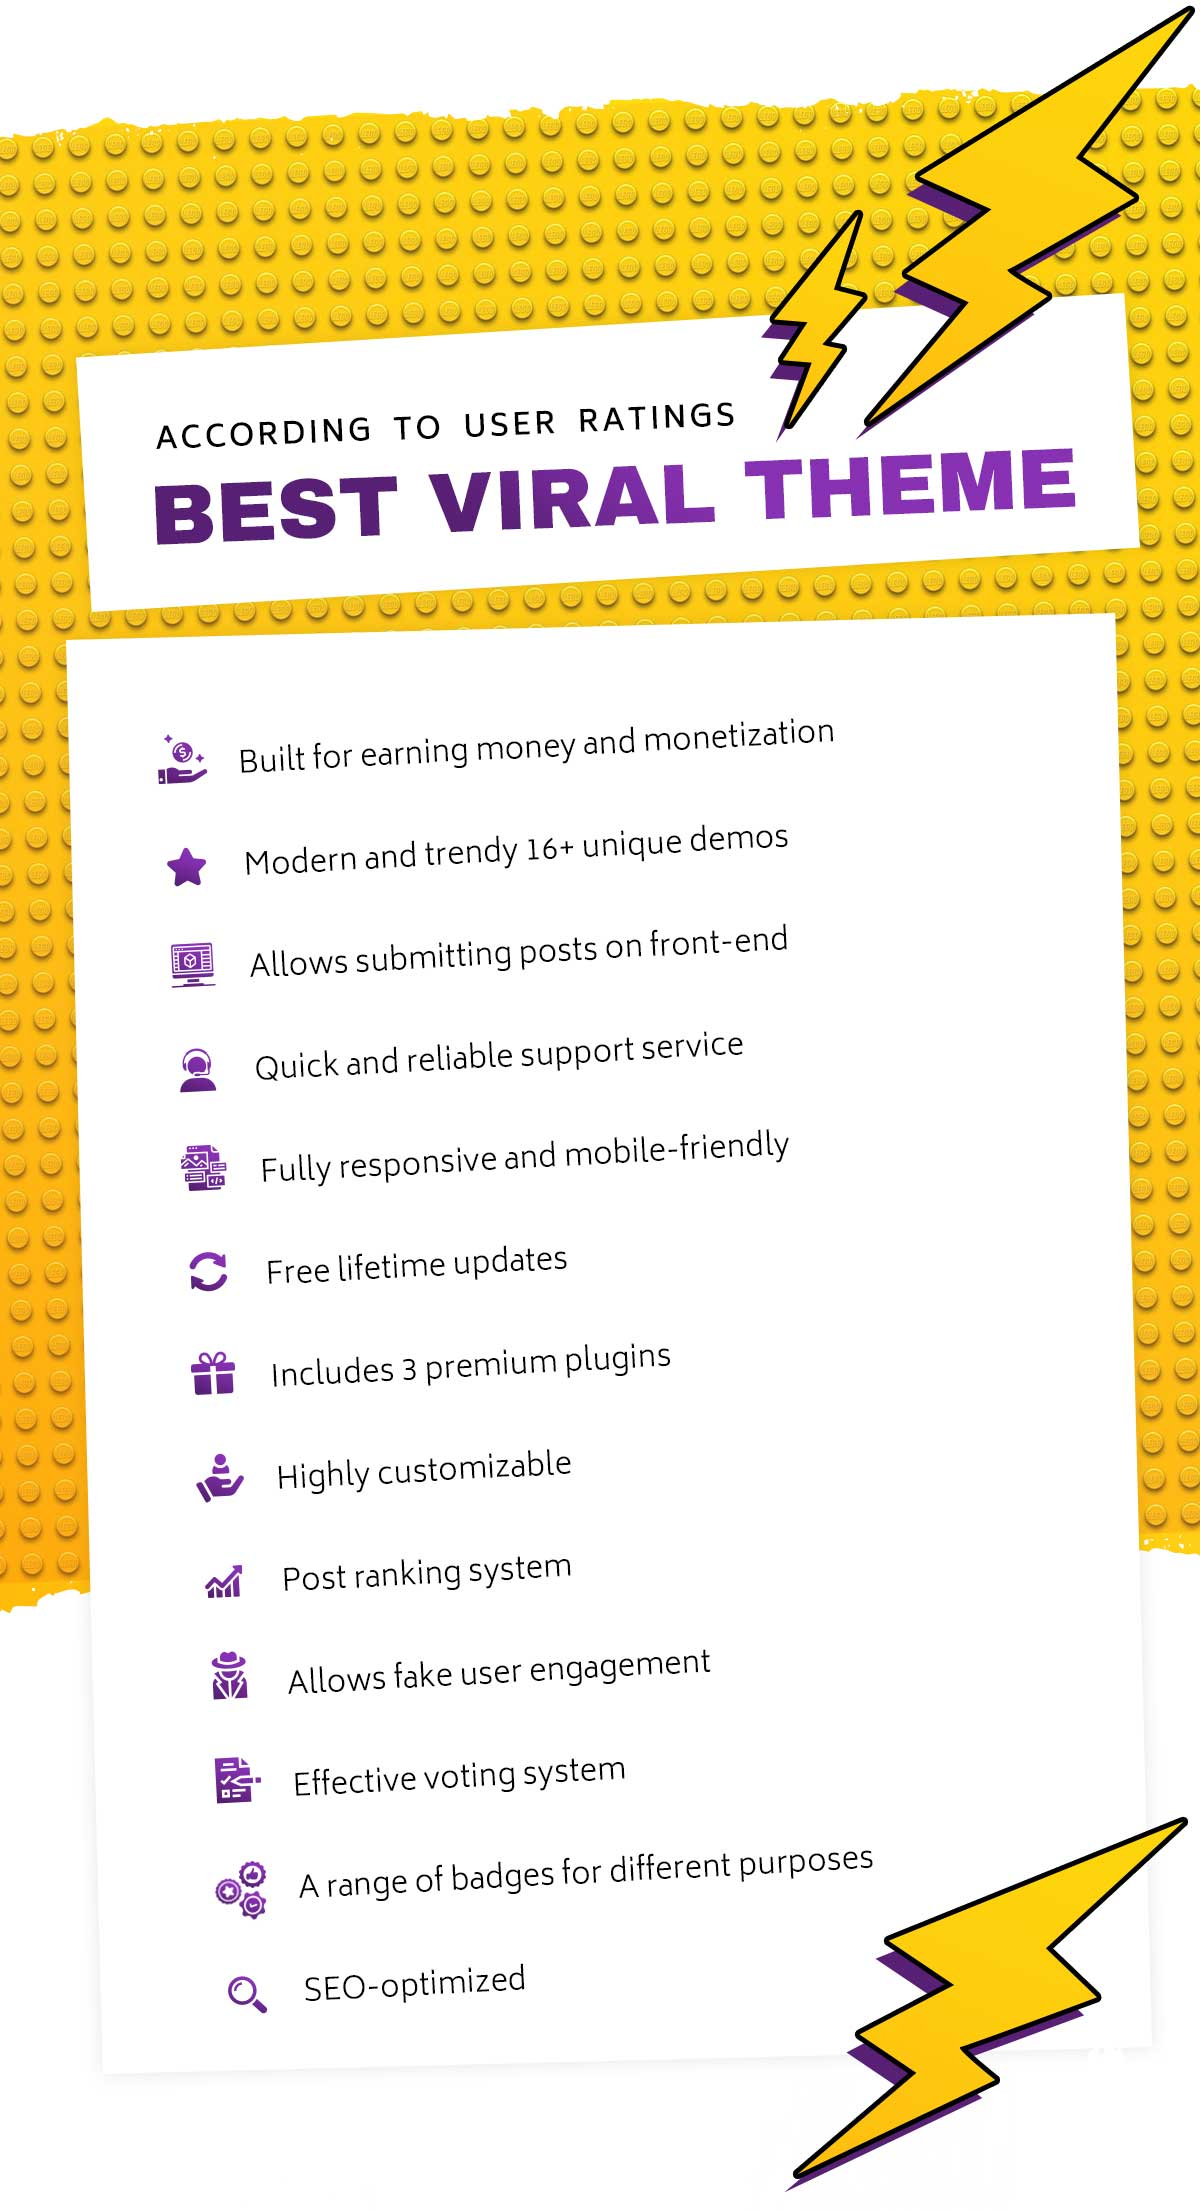 Boombox New presentation best viral theme - BoomBox — Viral Magazine WordPress Theme